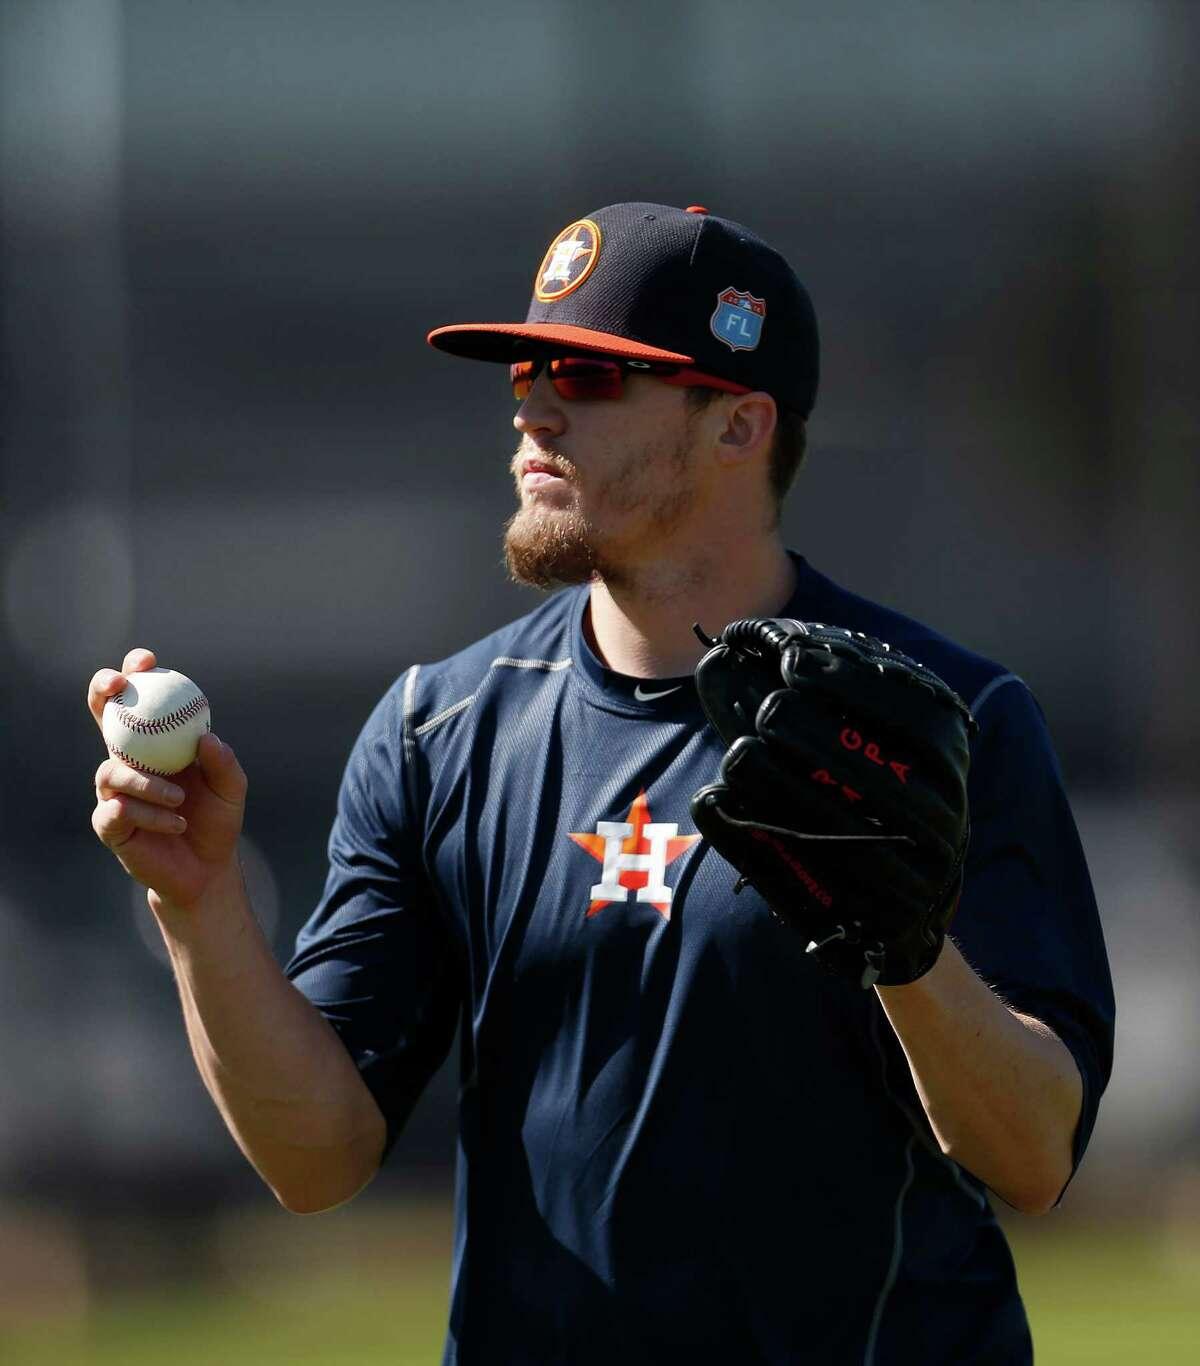 Houston Astros pitcher Ken Giles warms up during report day for Houston Astros pitchers and catchers at their Osceola County facility, in Kissmmee, FL, Thursday, Feb. 18, 2016. ( Karen Warren / Houston Chronicle )